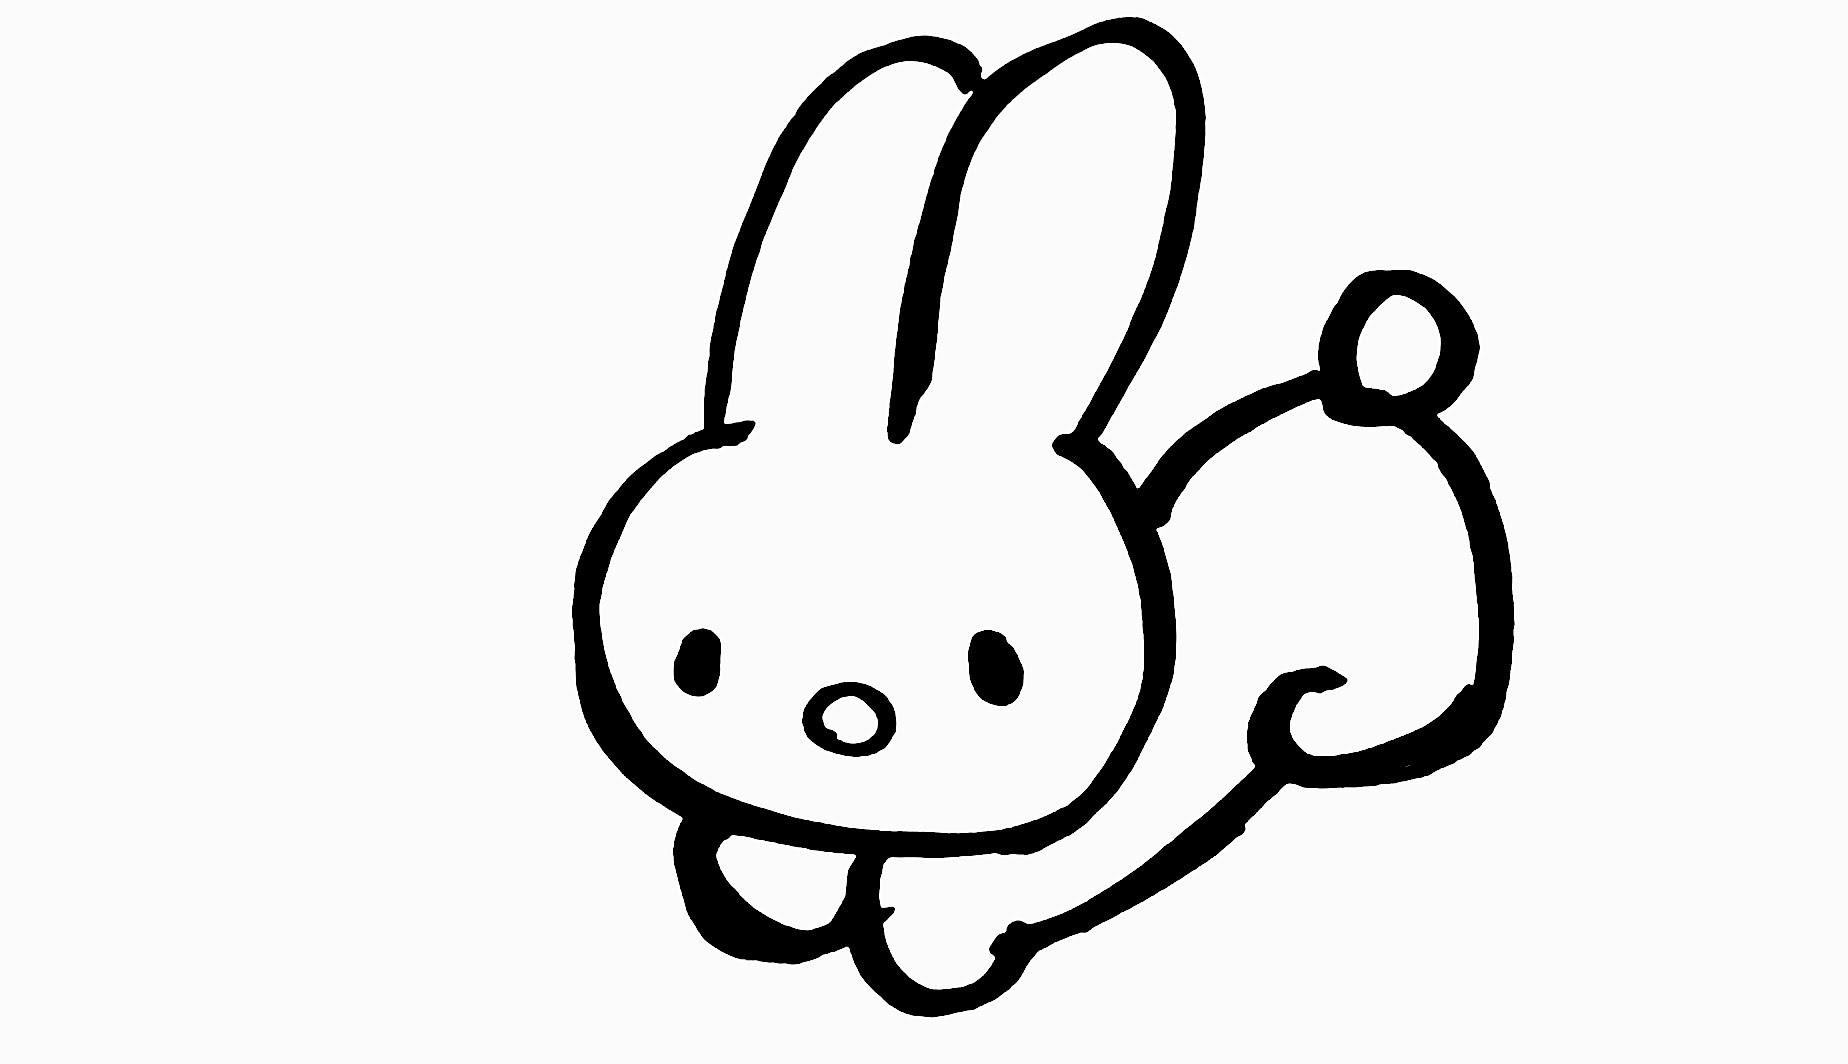 Drawn rabbit invasion Draw A Photo Version